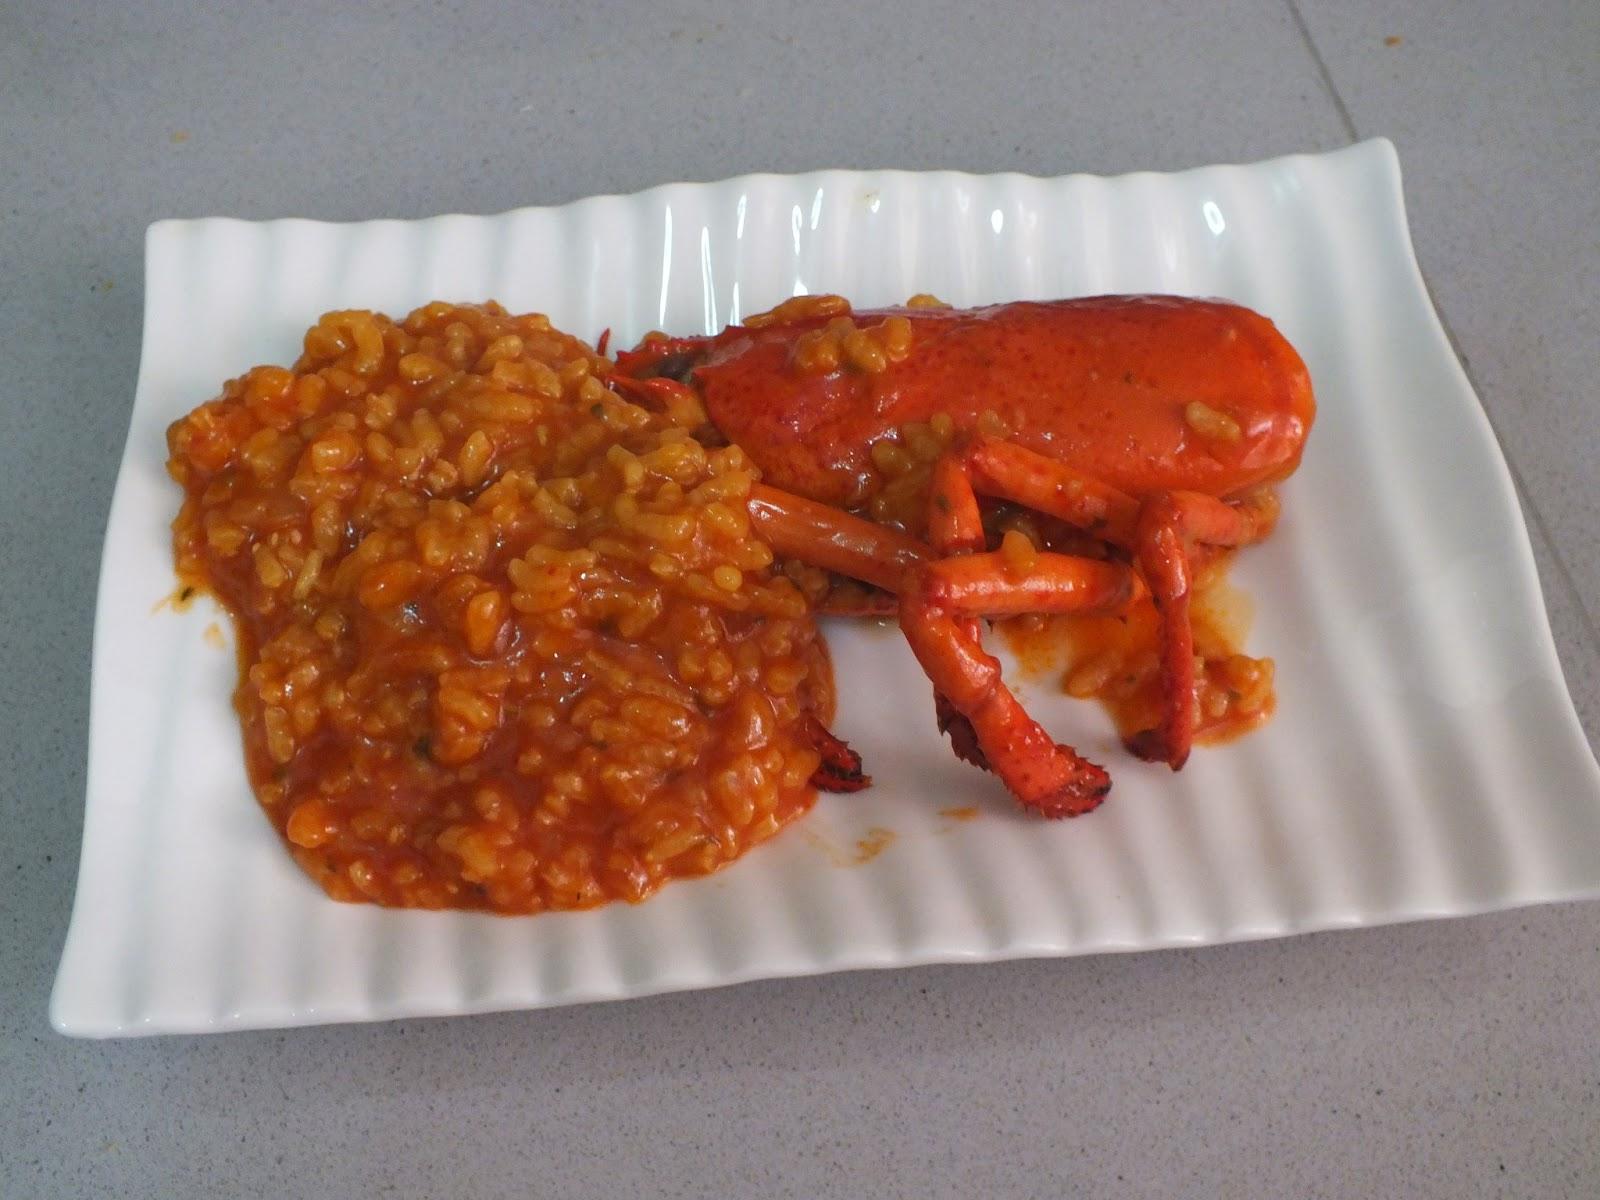 Escuela de cocina pako amor bogavante con arroz caldoso - Escuela de cocina paco amor ...